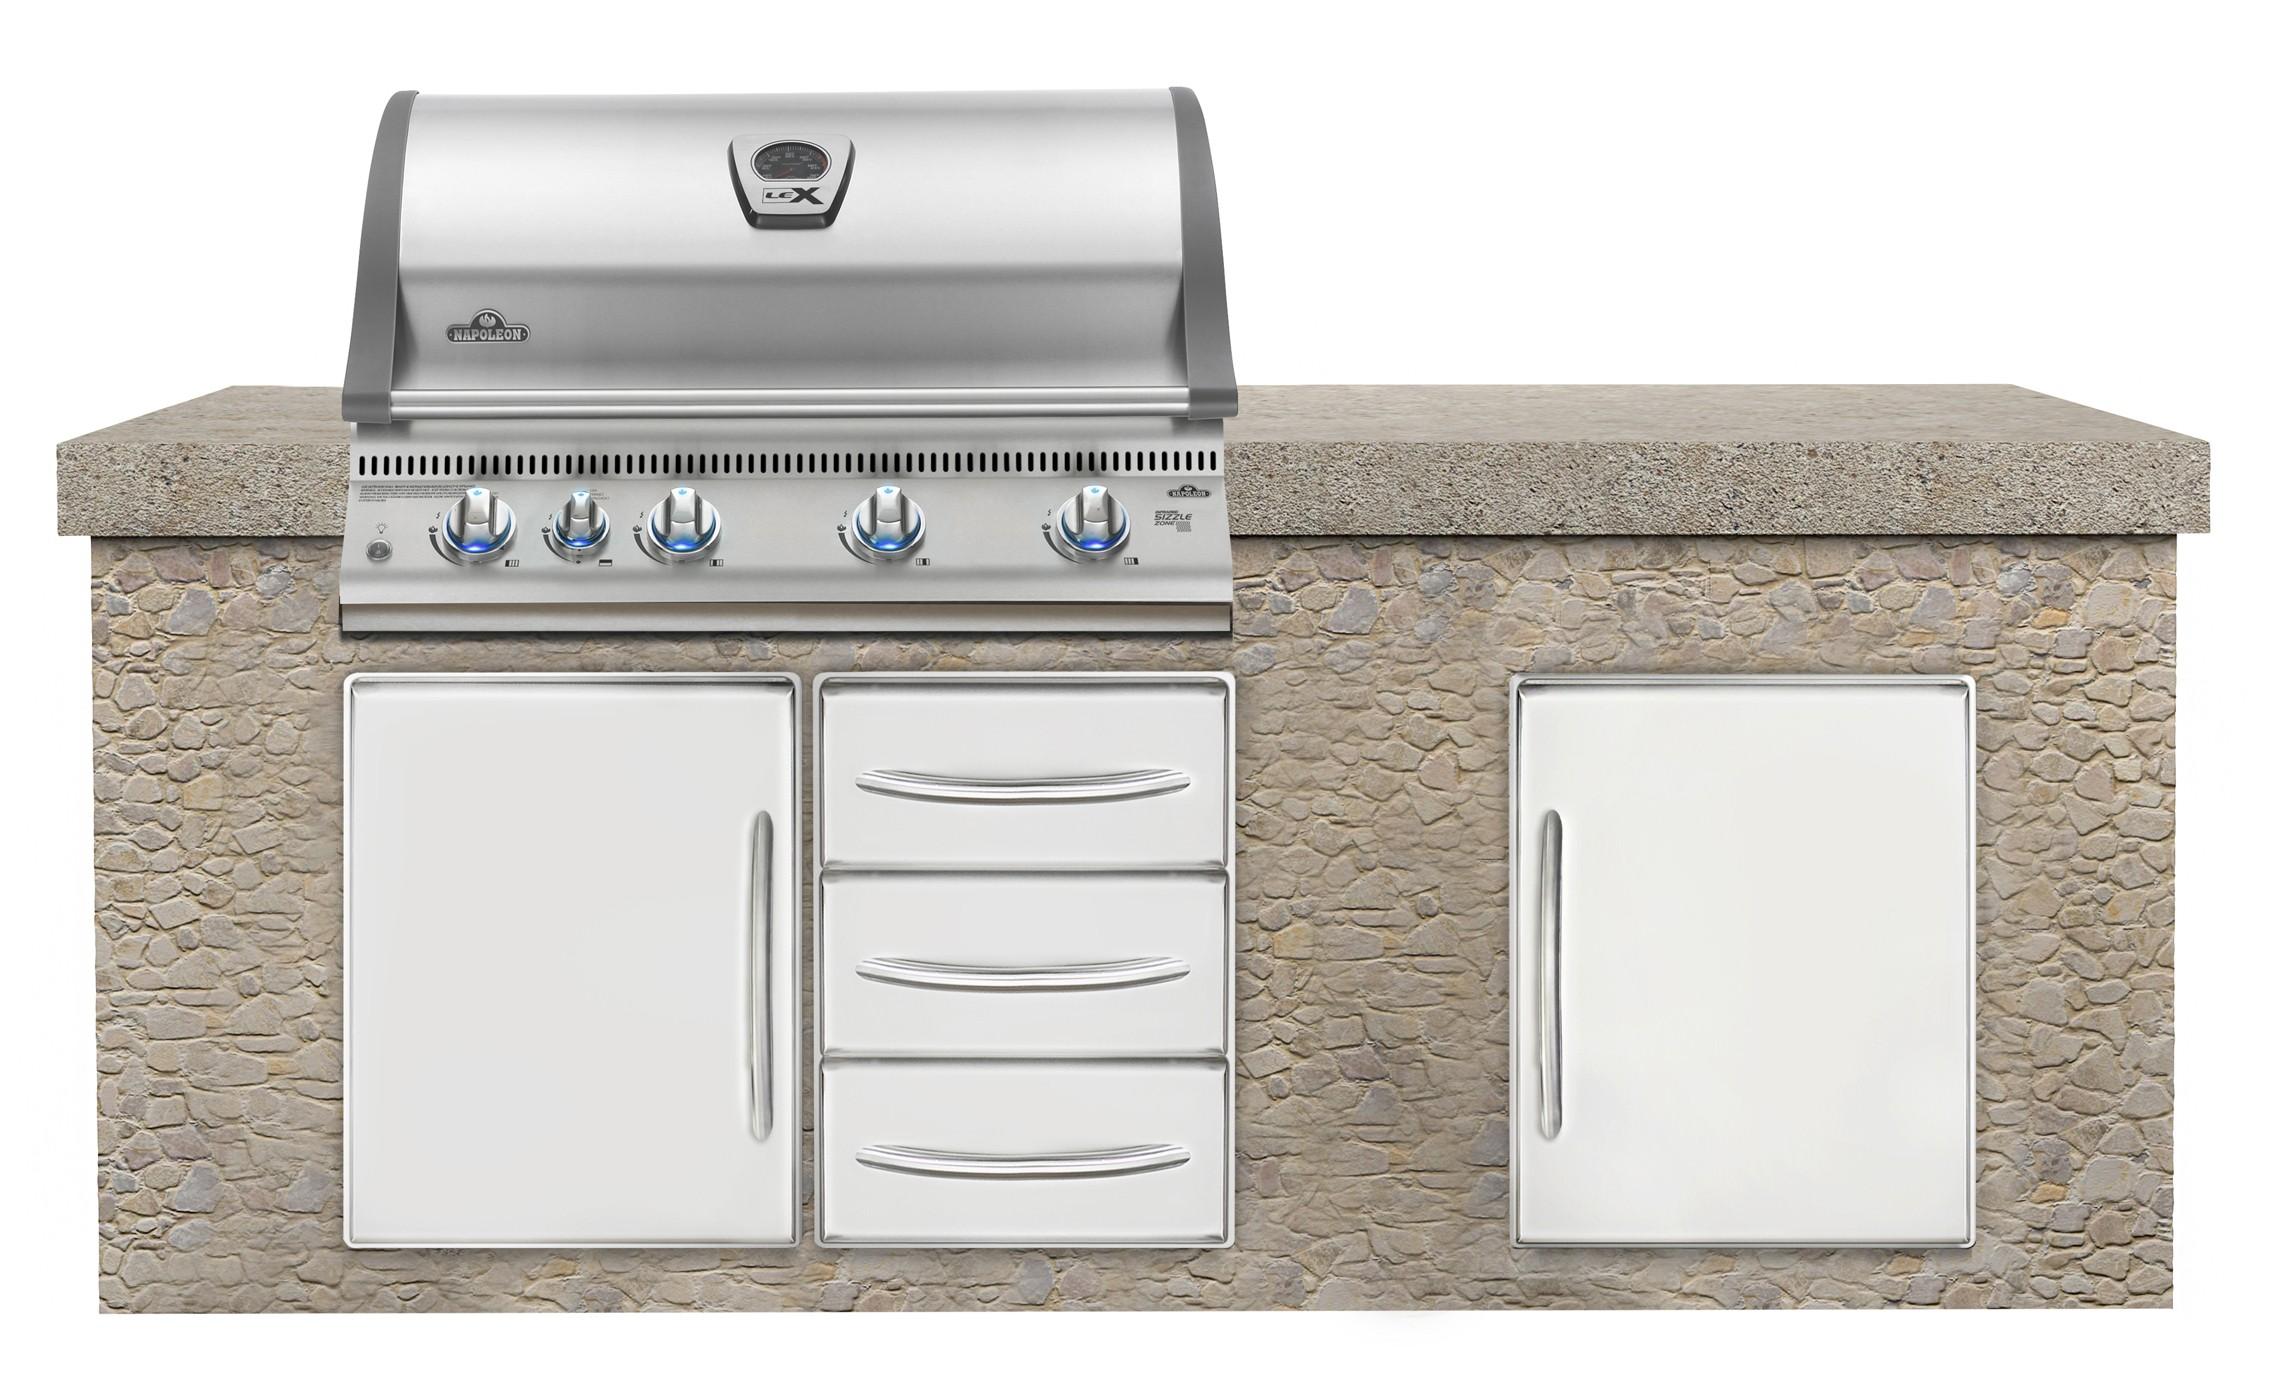 gasgrill einbaugrillaufsatz napoleon lex 605 edelstahl propangas bei. Black Bedroom Furniture Sets. Home Design Ideas